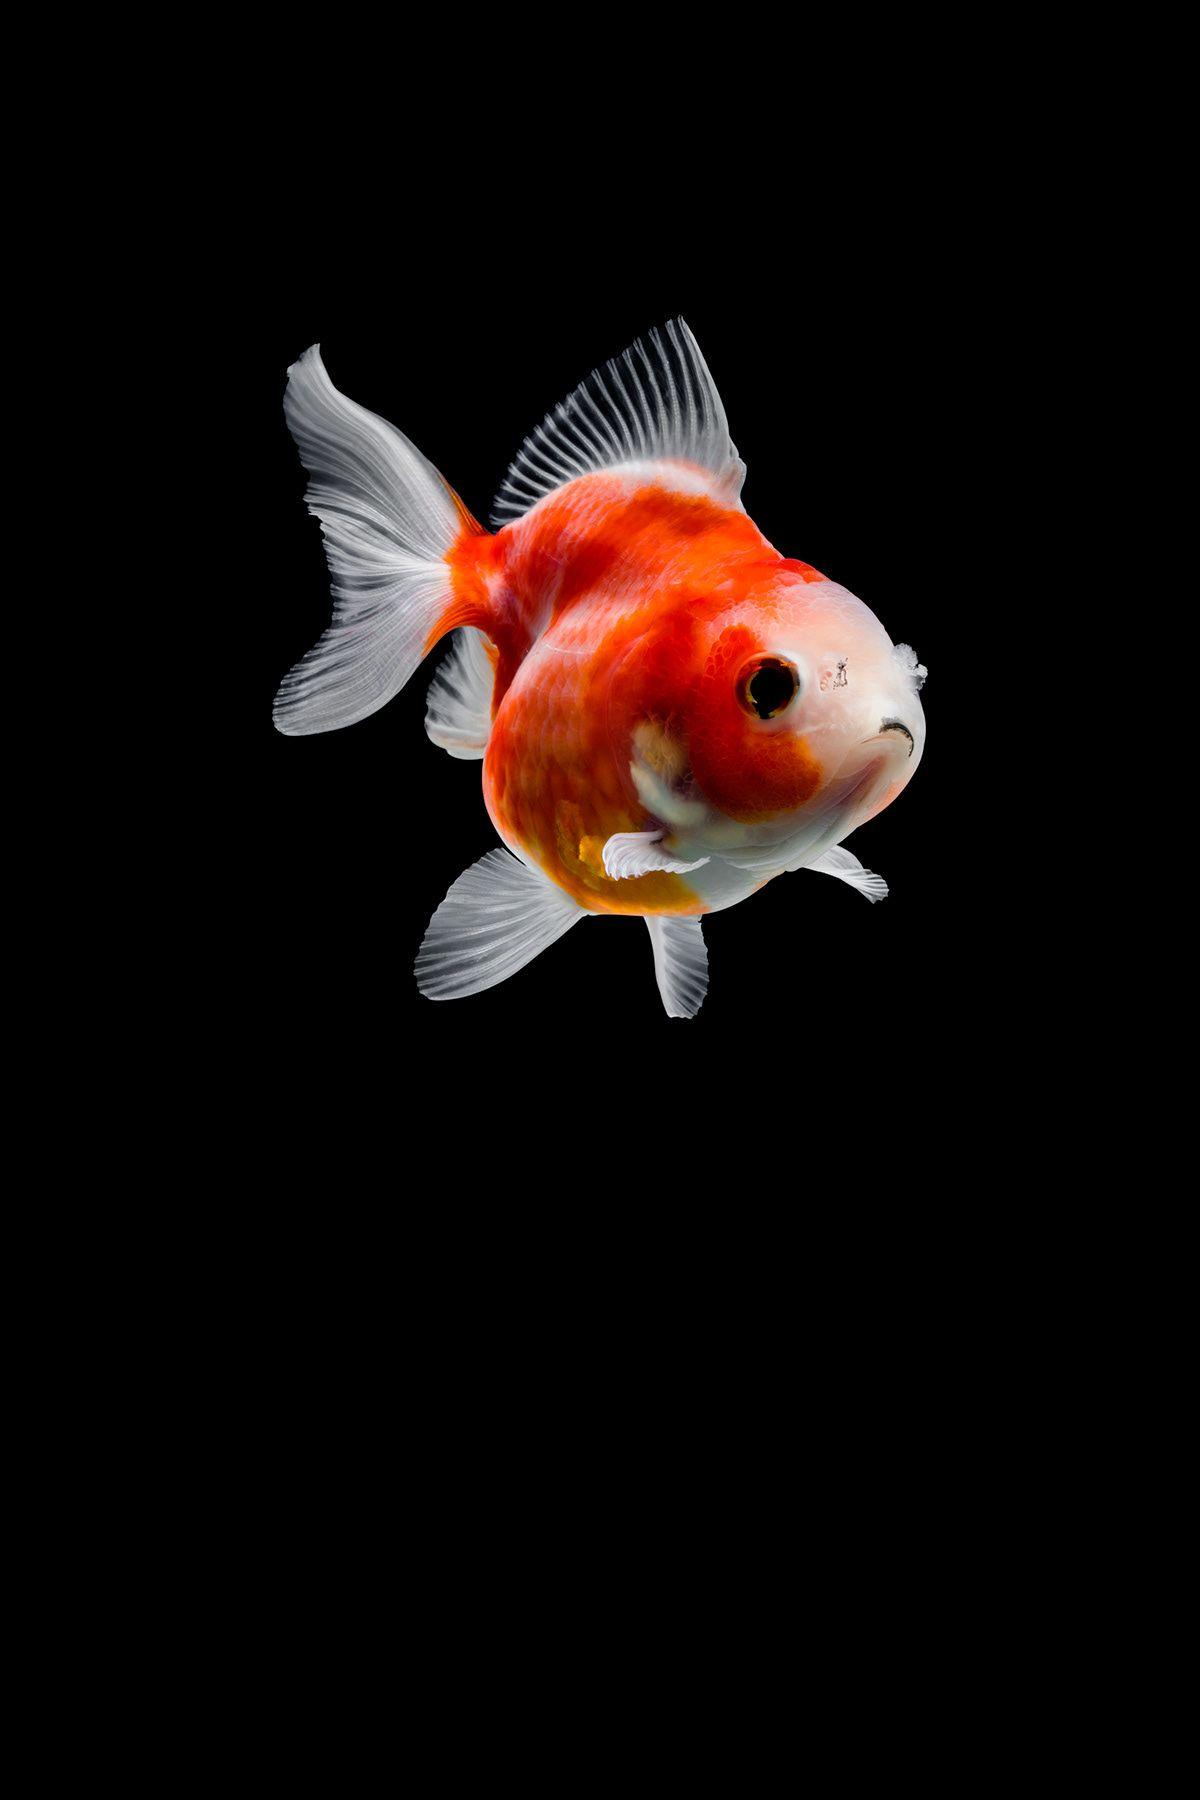 Goldfish On Behance Goldfish Goldfish Wallpaper Cute Fish